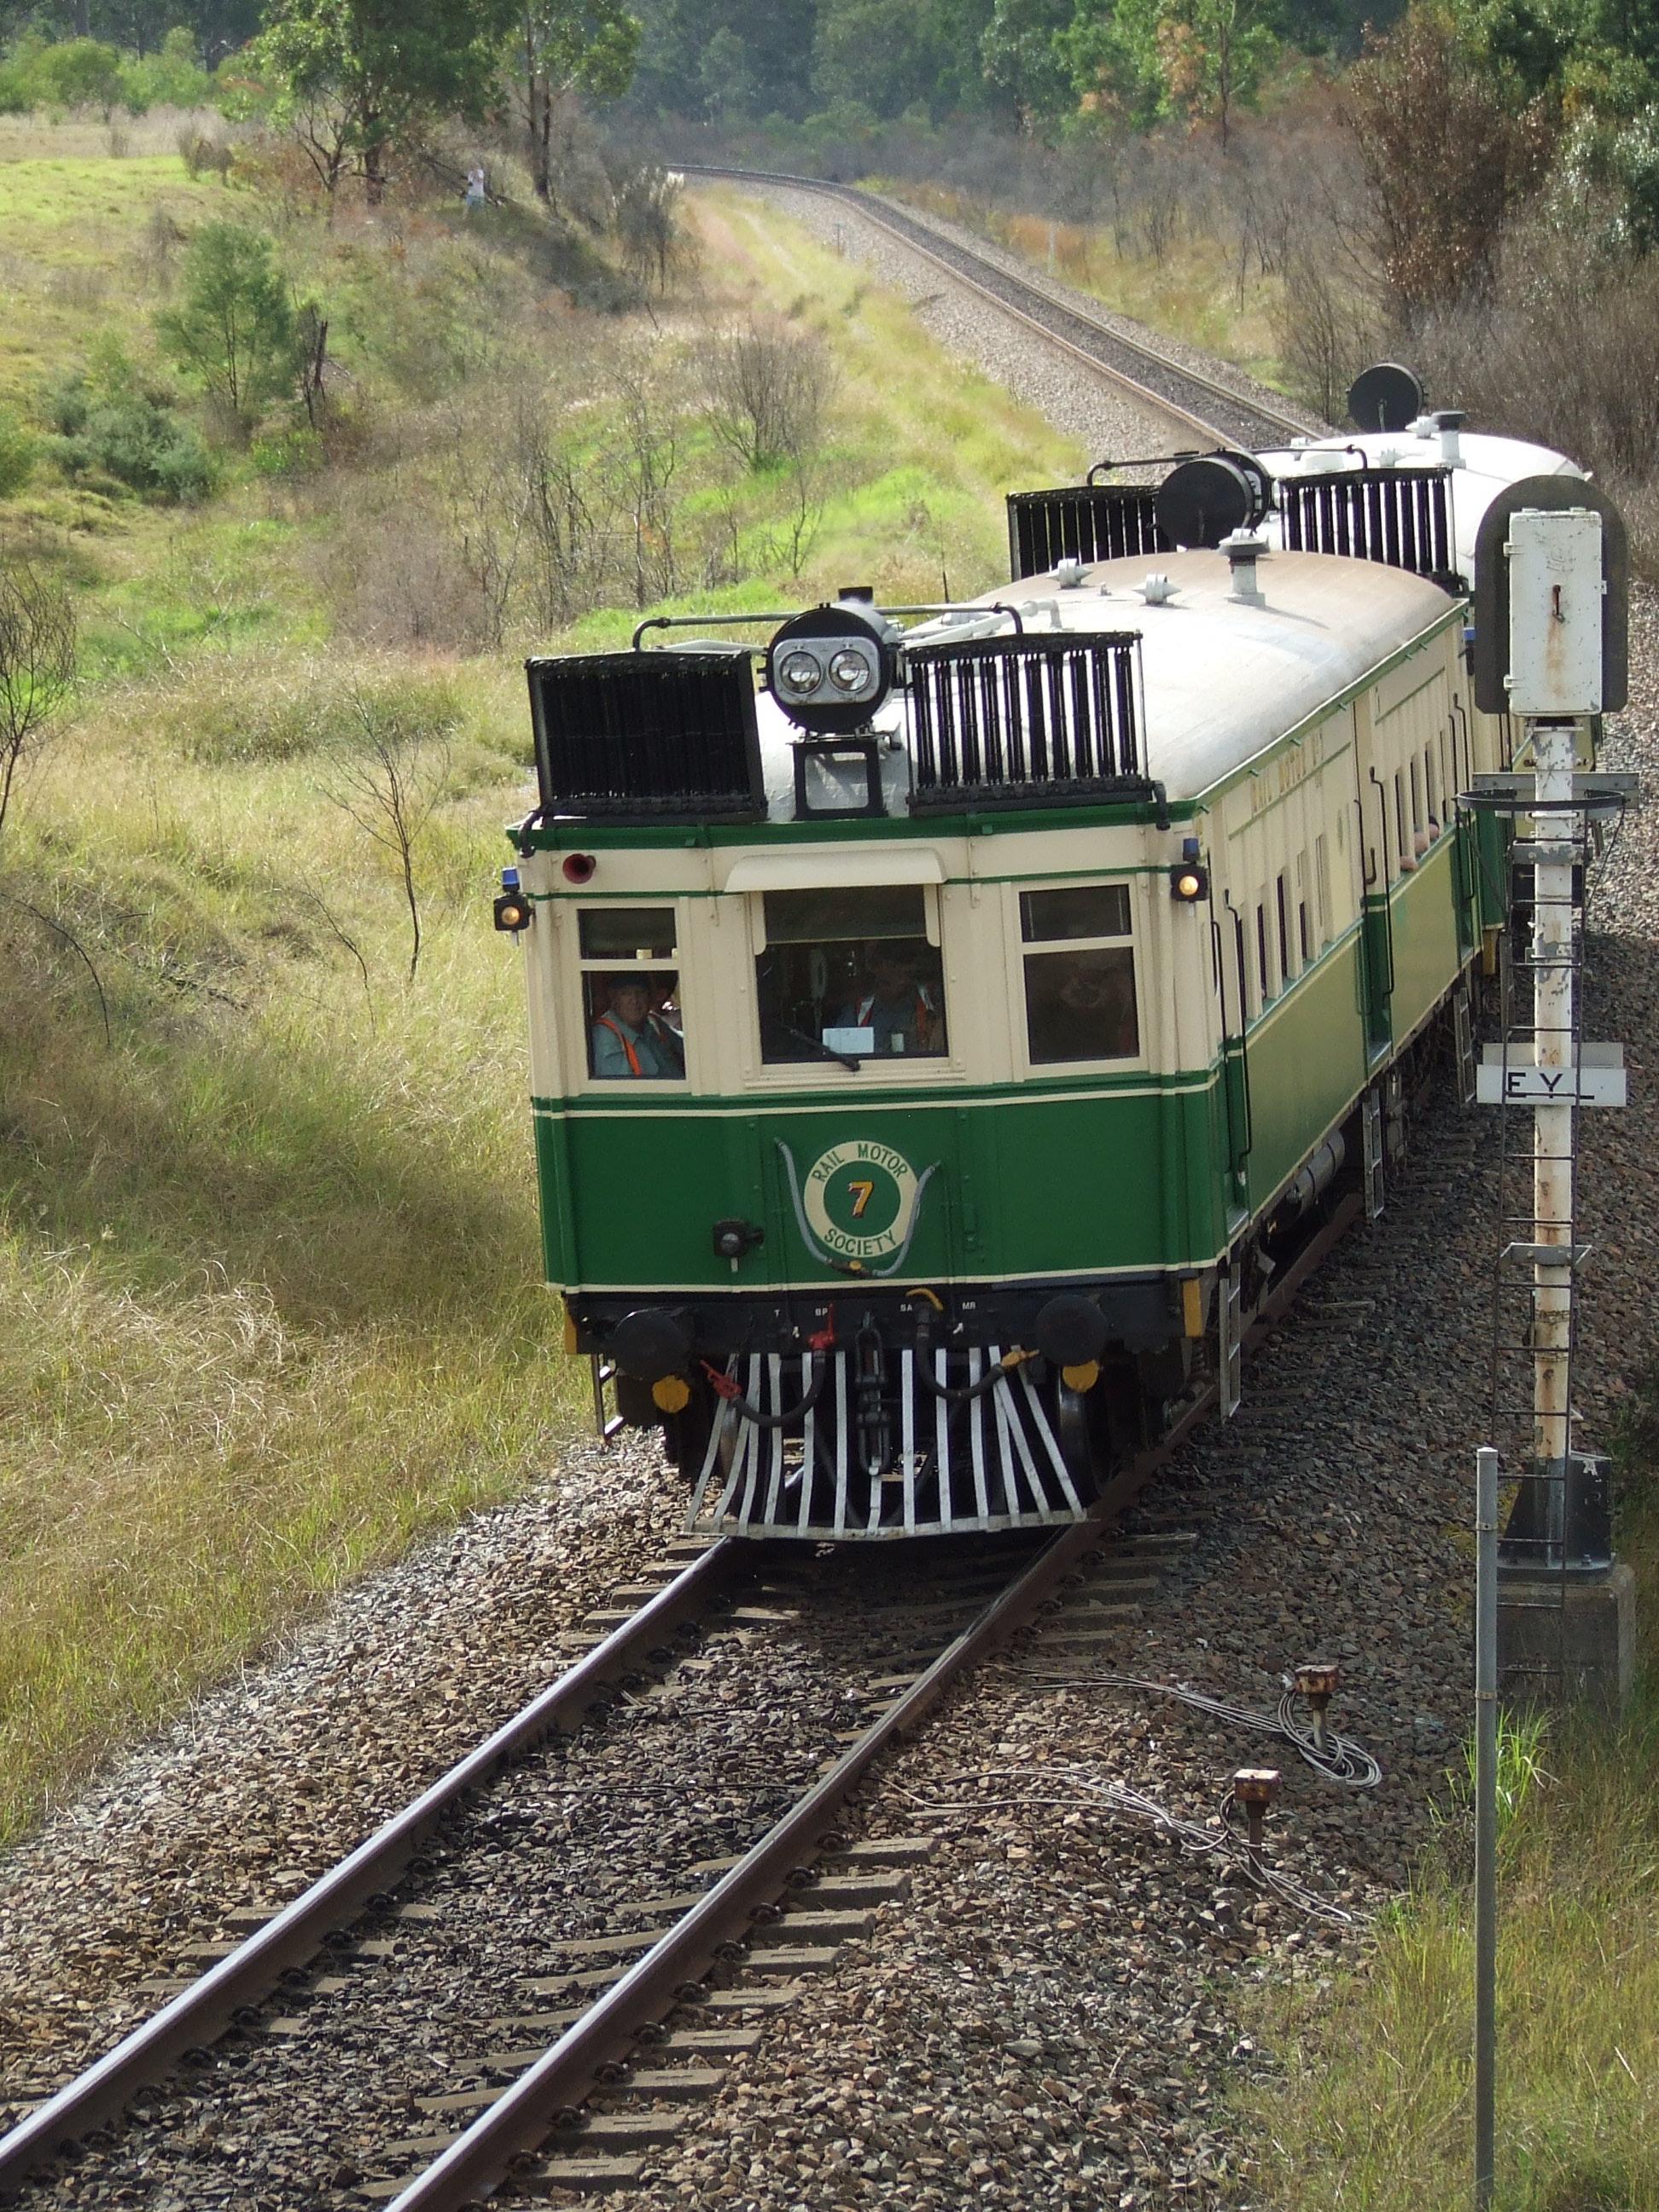 Free stock photo of Heritage, railway, steam trains